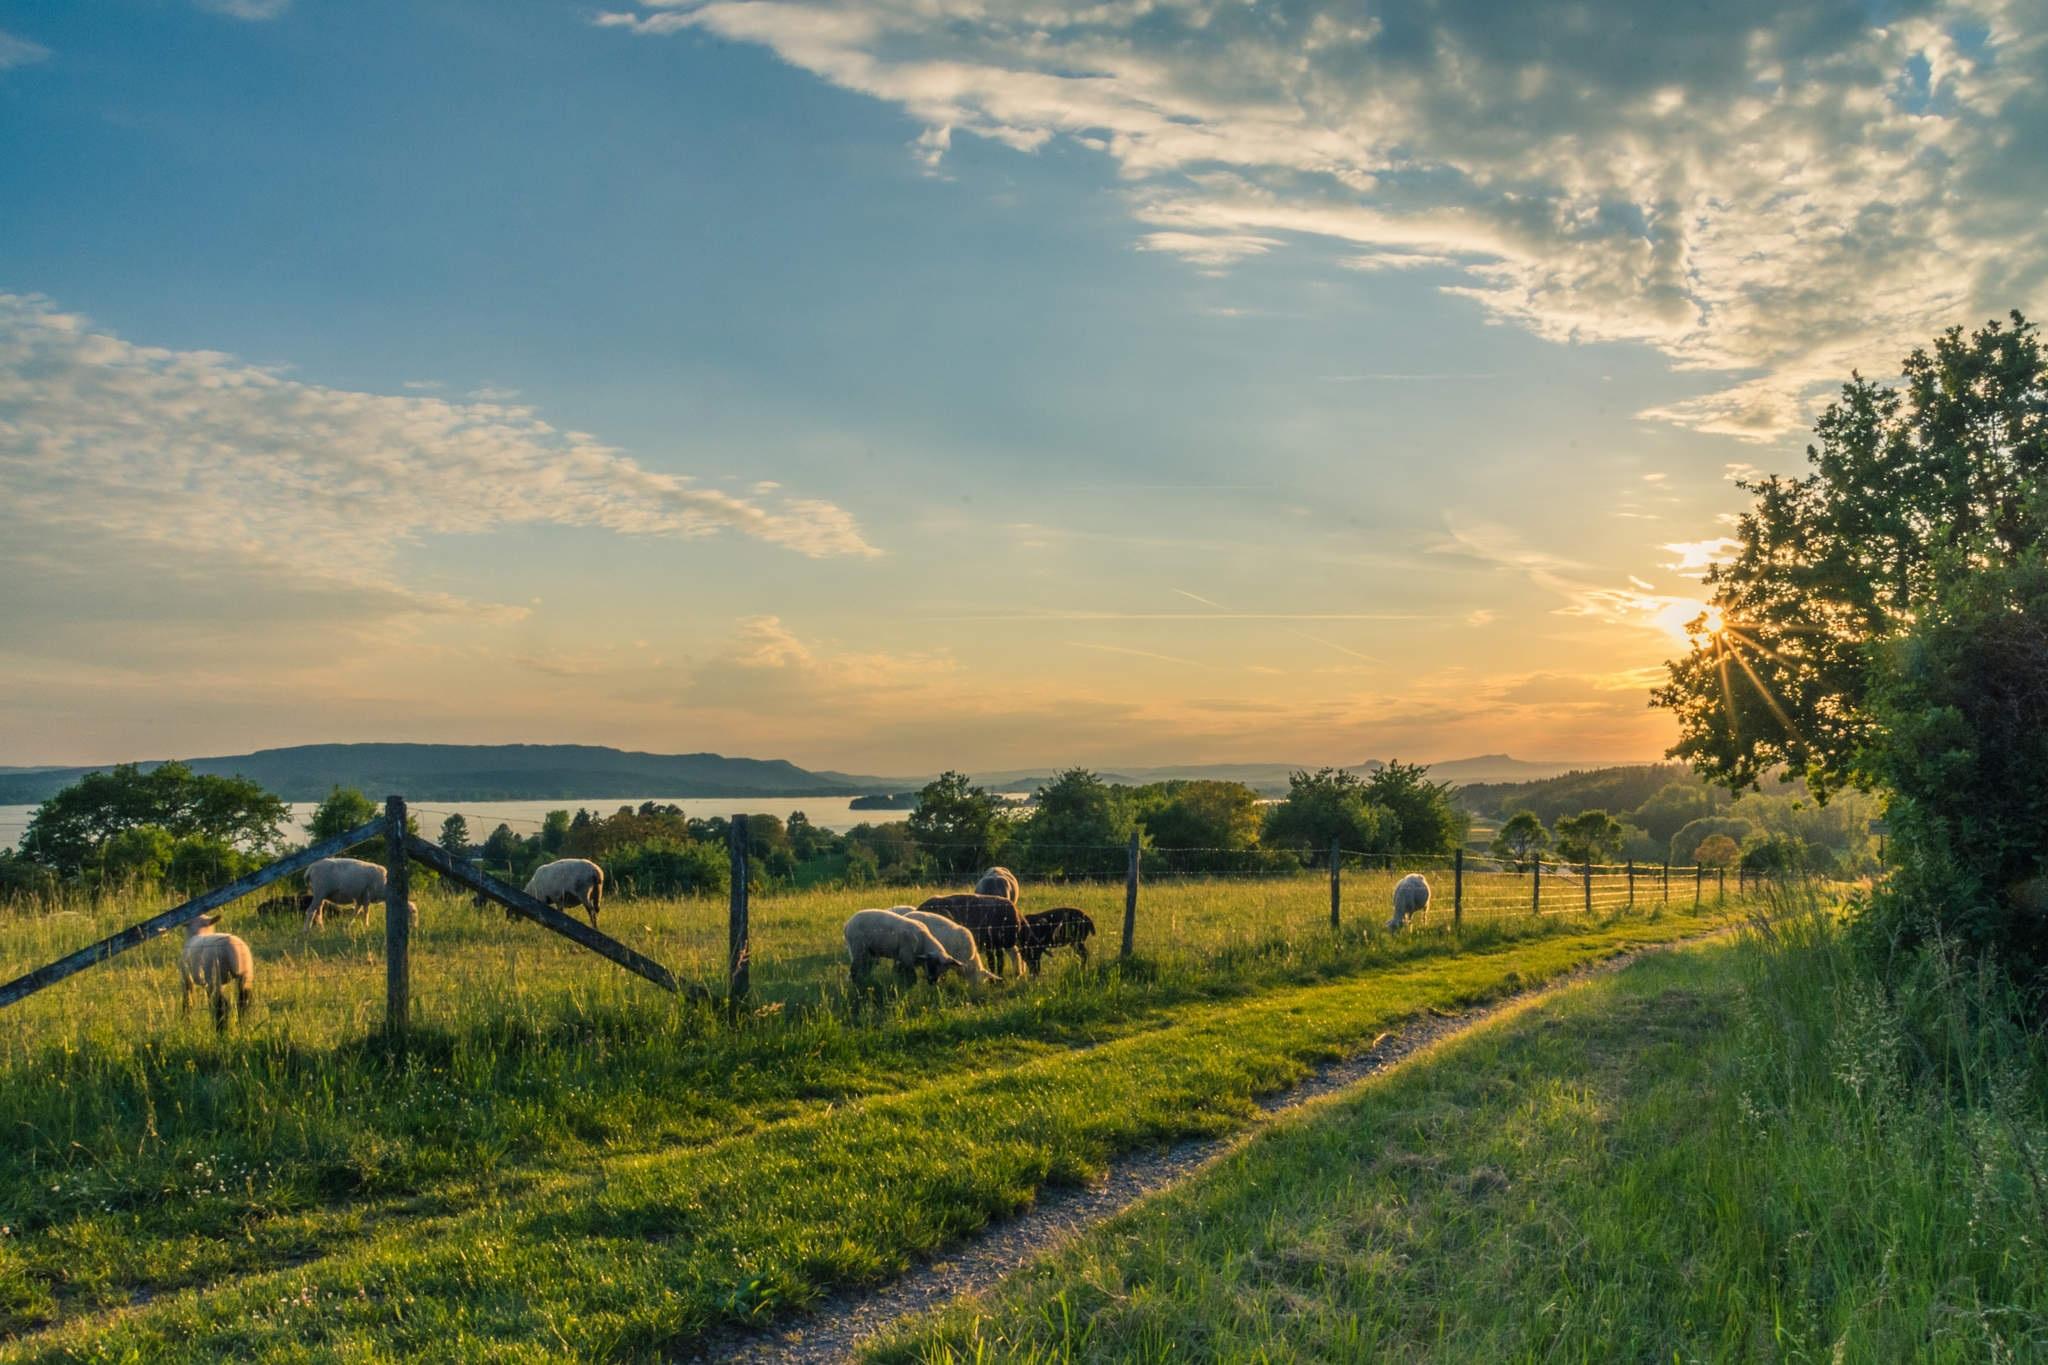 lake-constance-sheep-pasture-sheep-blue-158179.jpeg